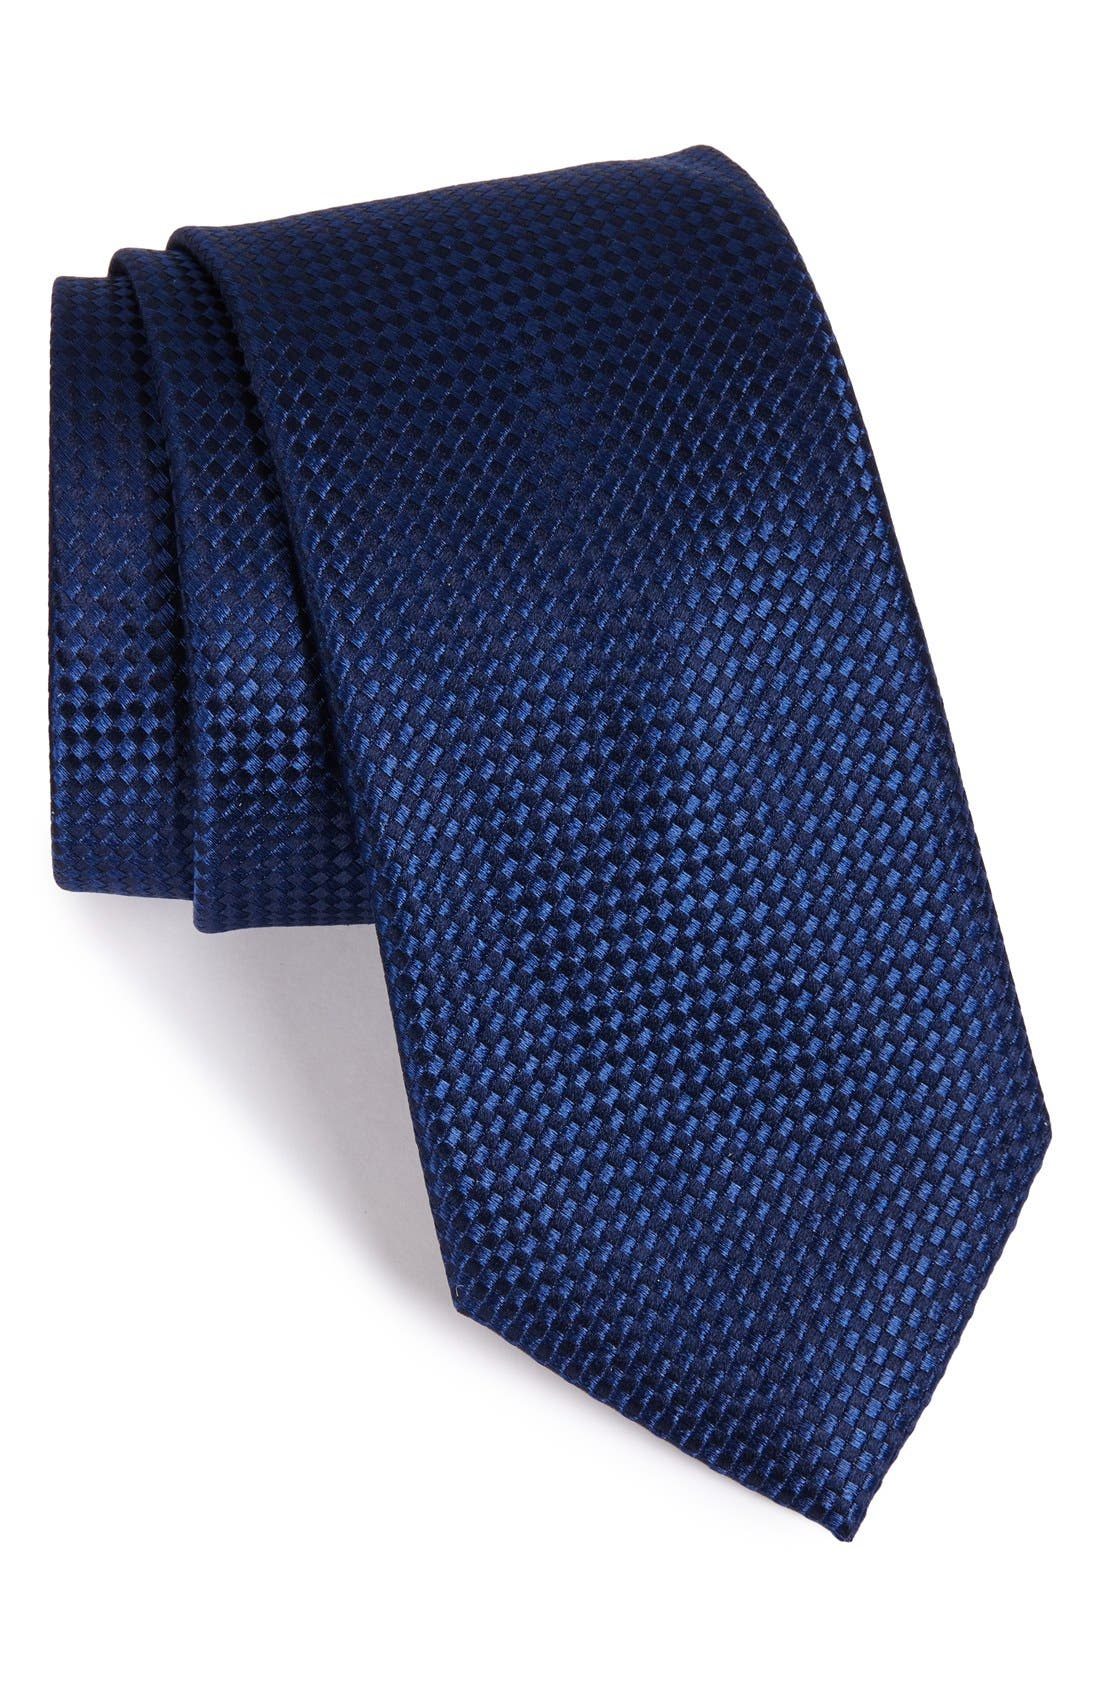 Main Image - Nordstrom Men's Shop 'Nate' Solid Silk Tie